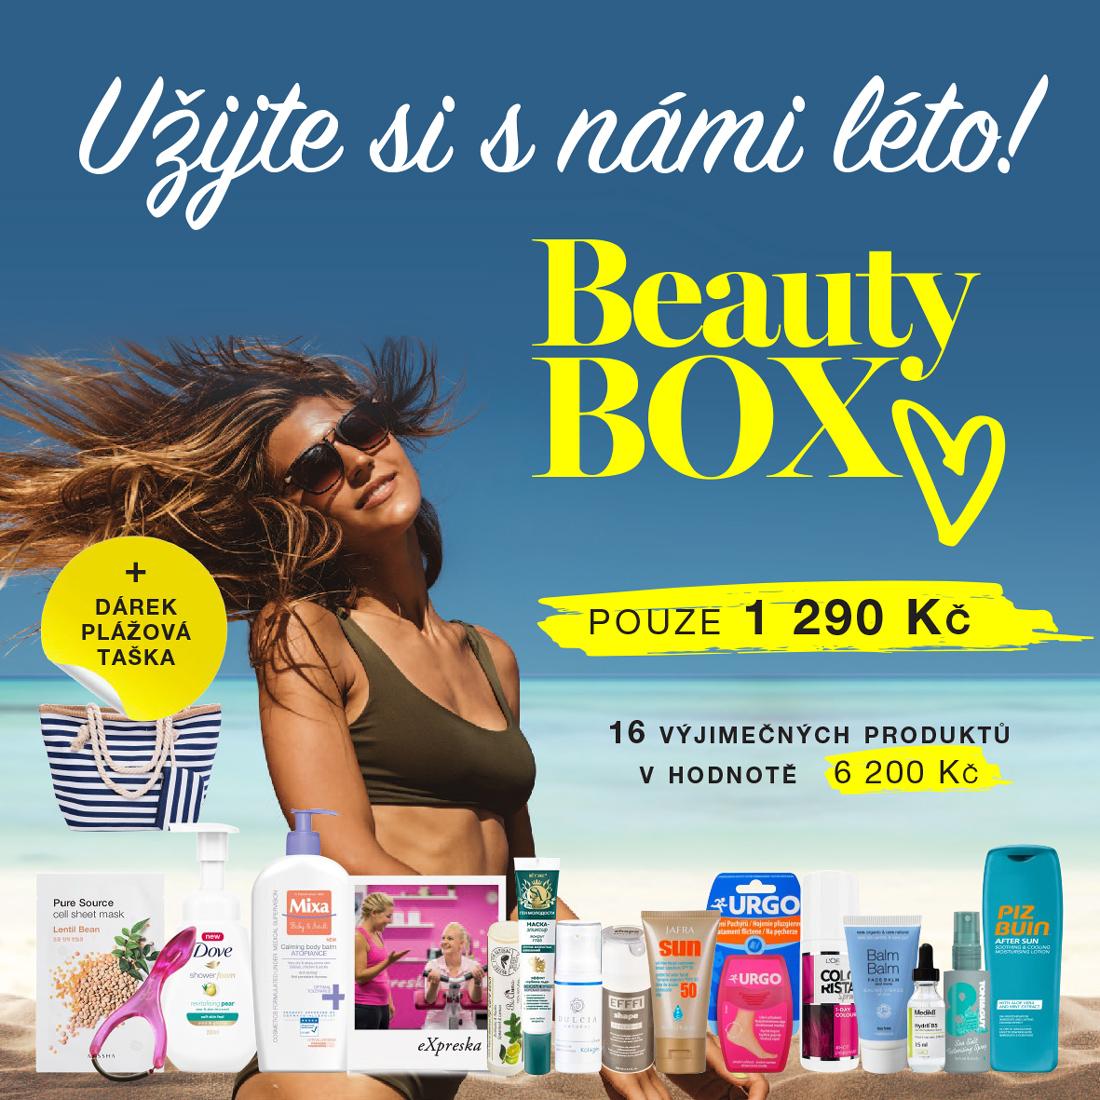 BeautyBag bannerBIG